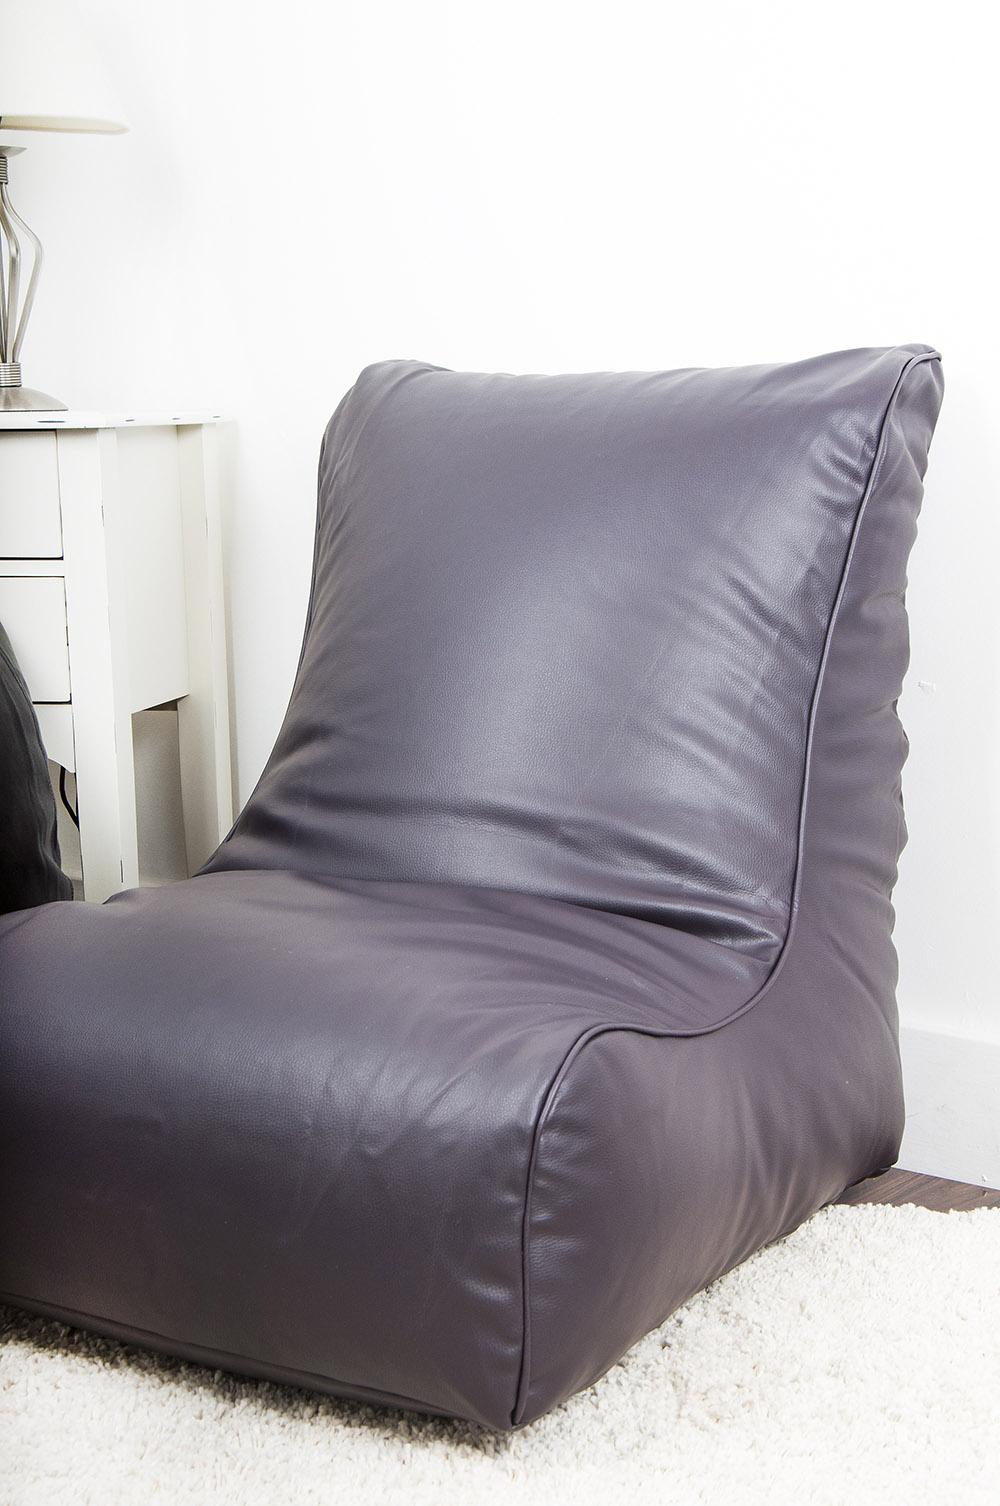 Leather Look Gaming Chair Bean Bag in Aubergine